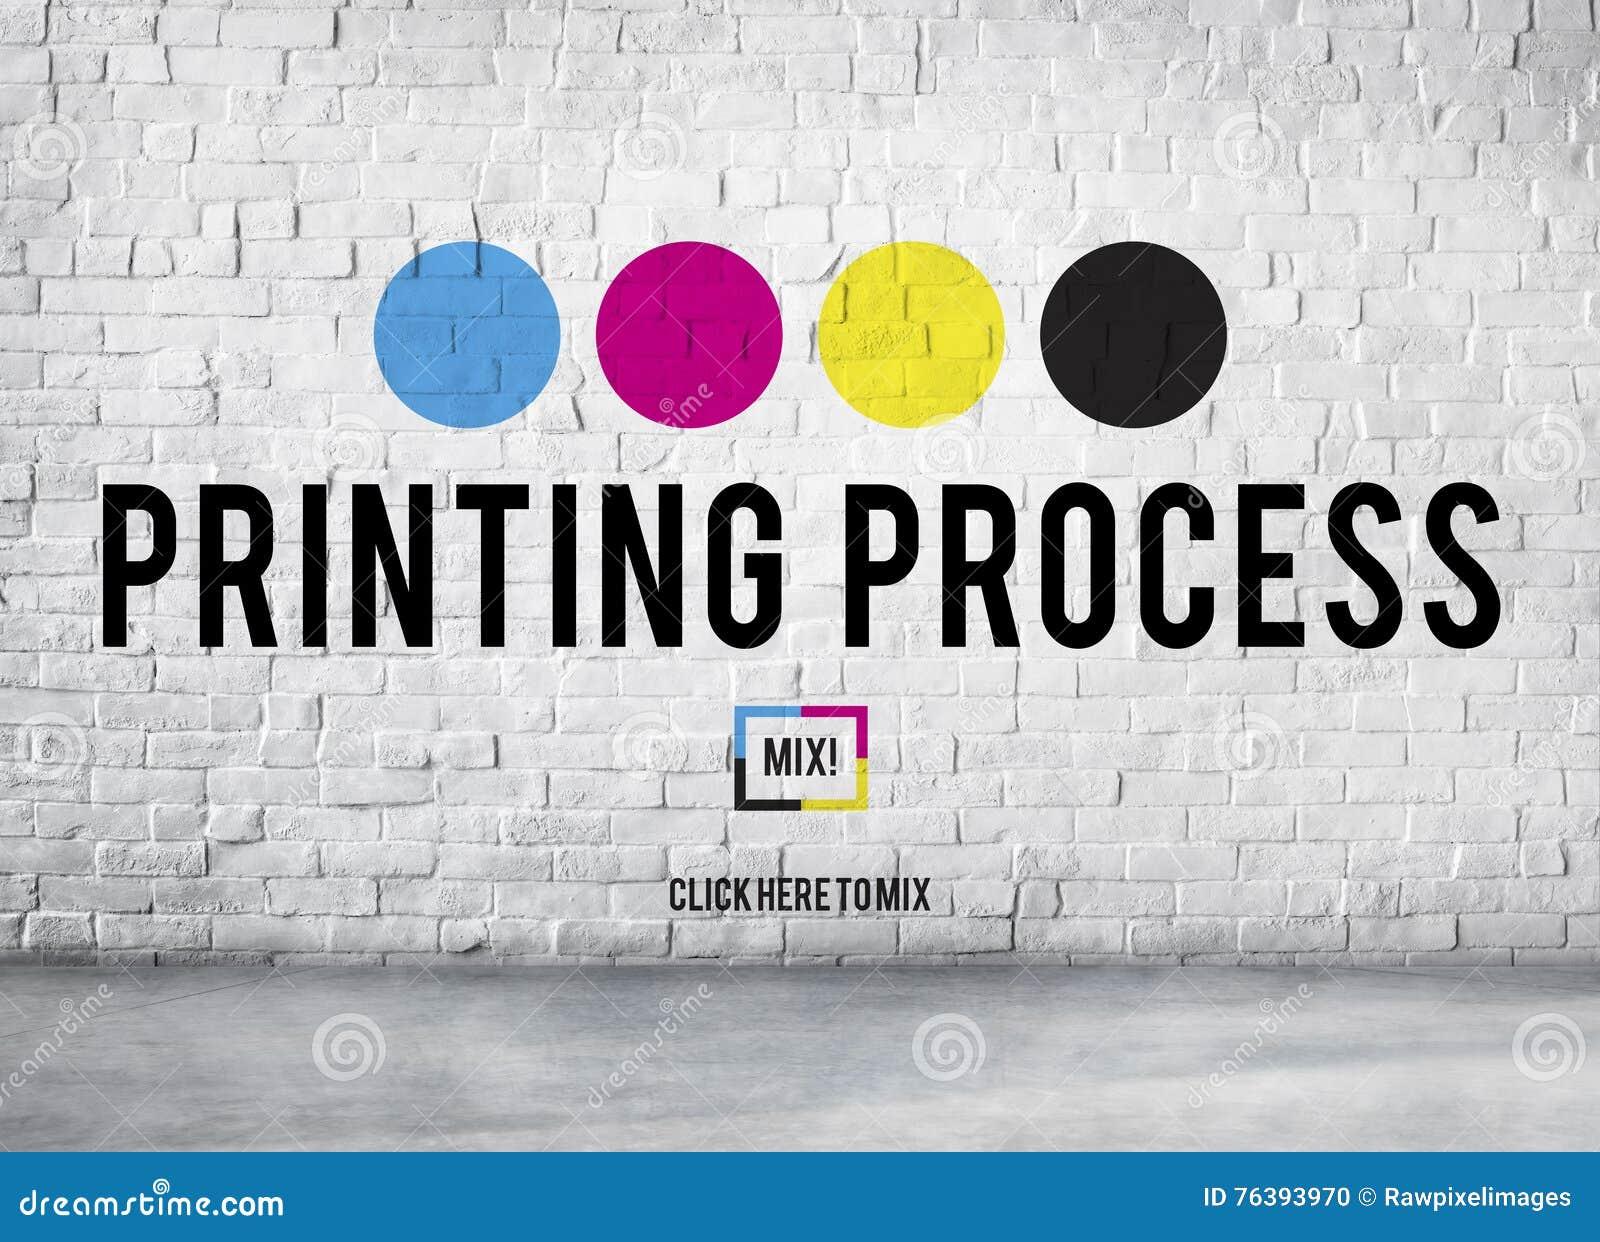 Printing Process CMYK Cyan Magenta Yellow Key Concept